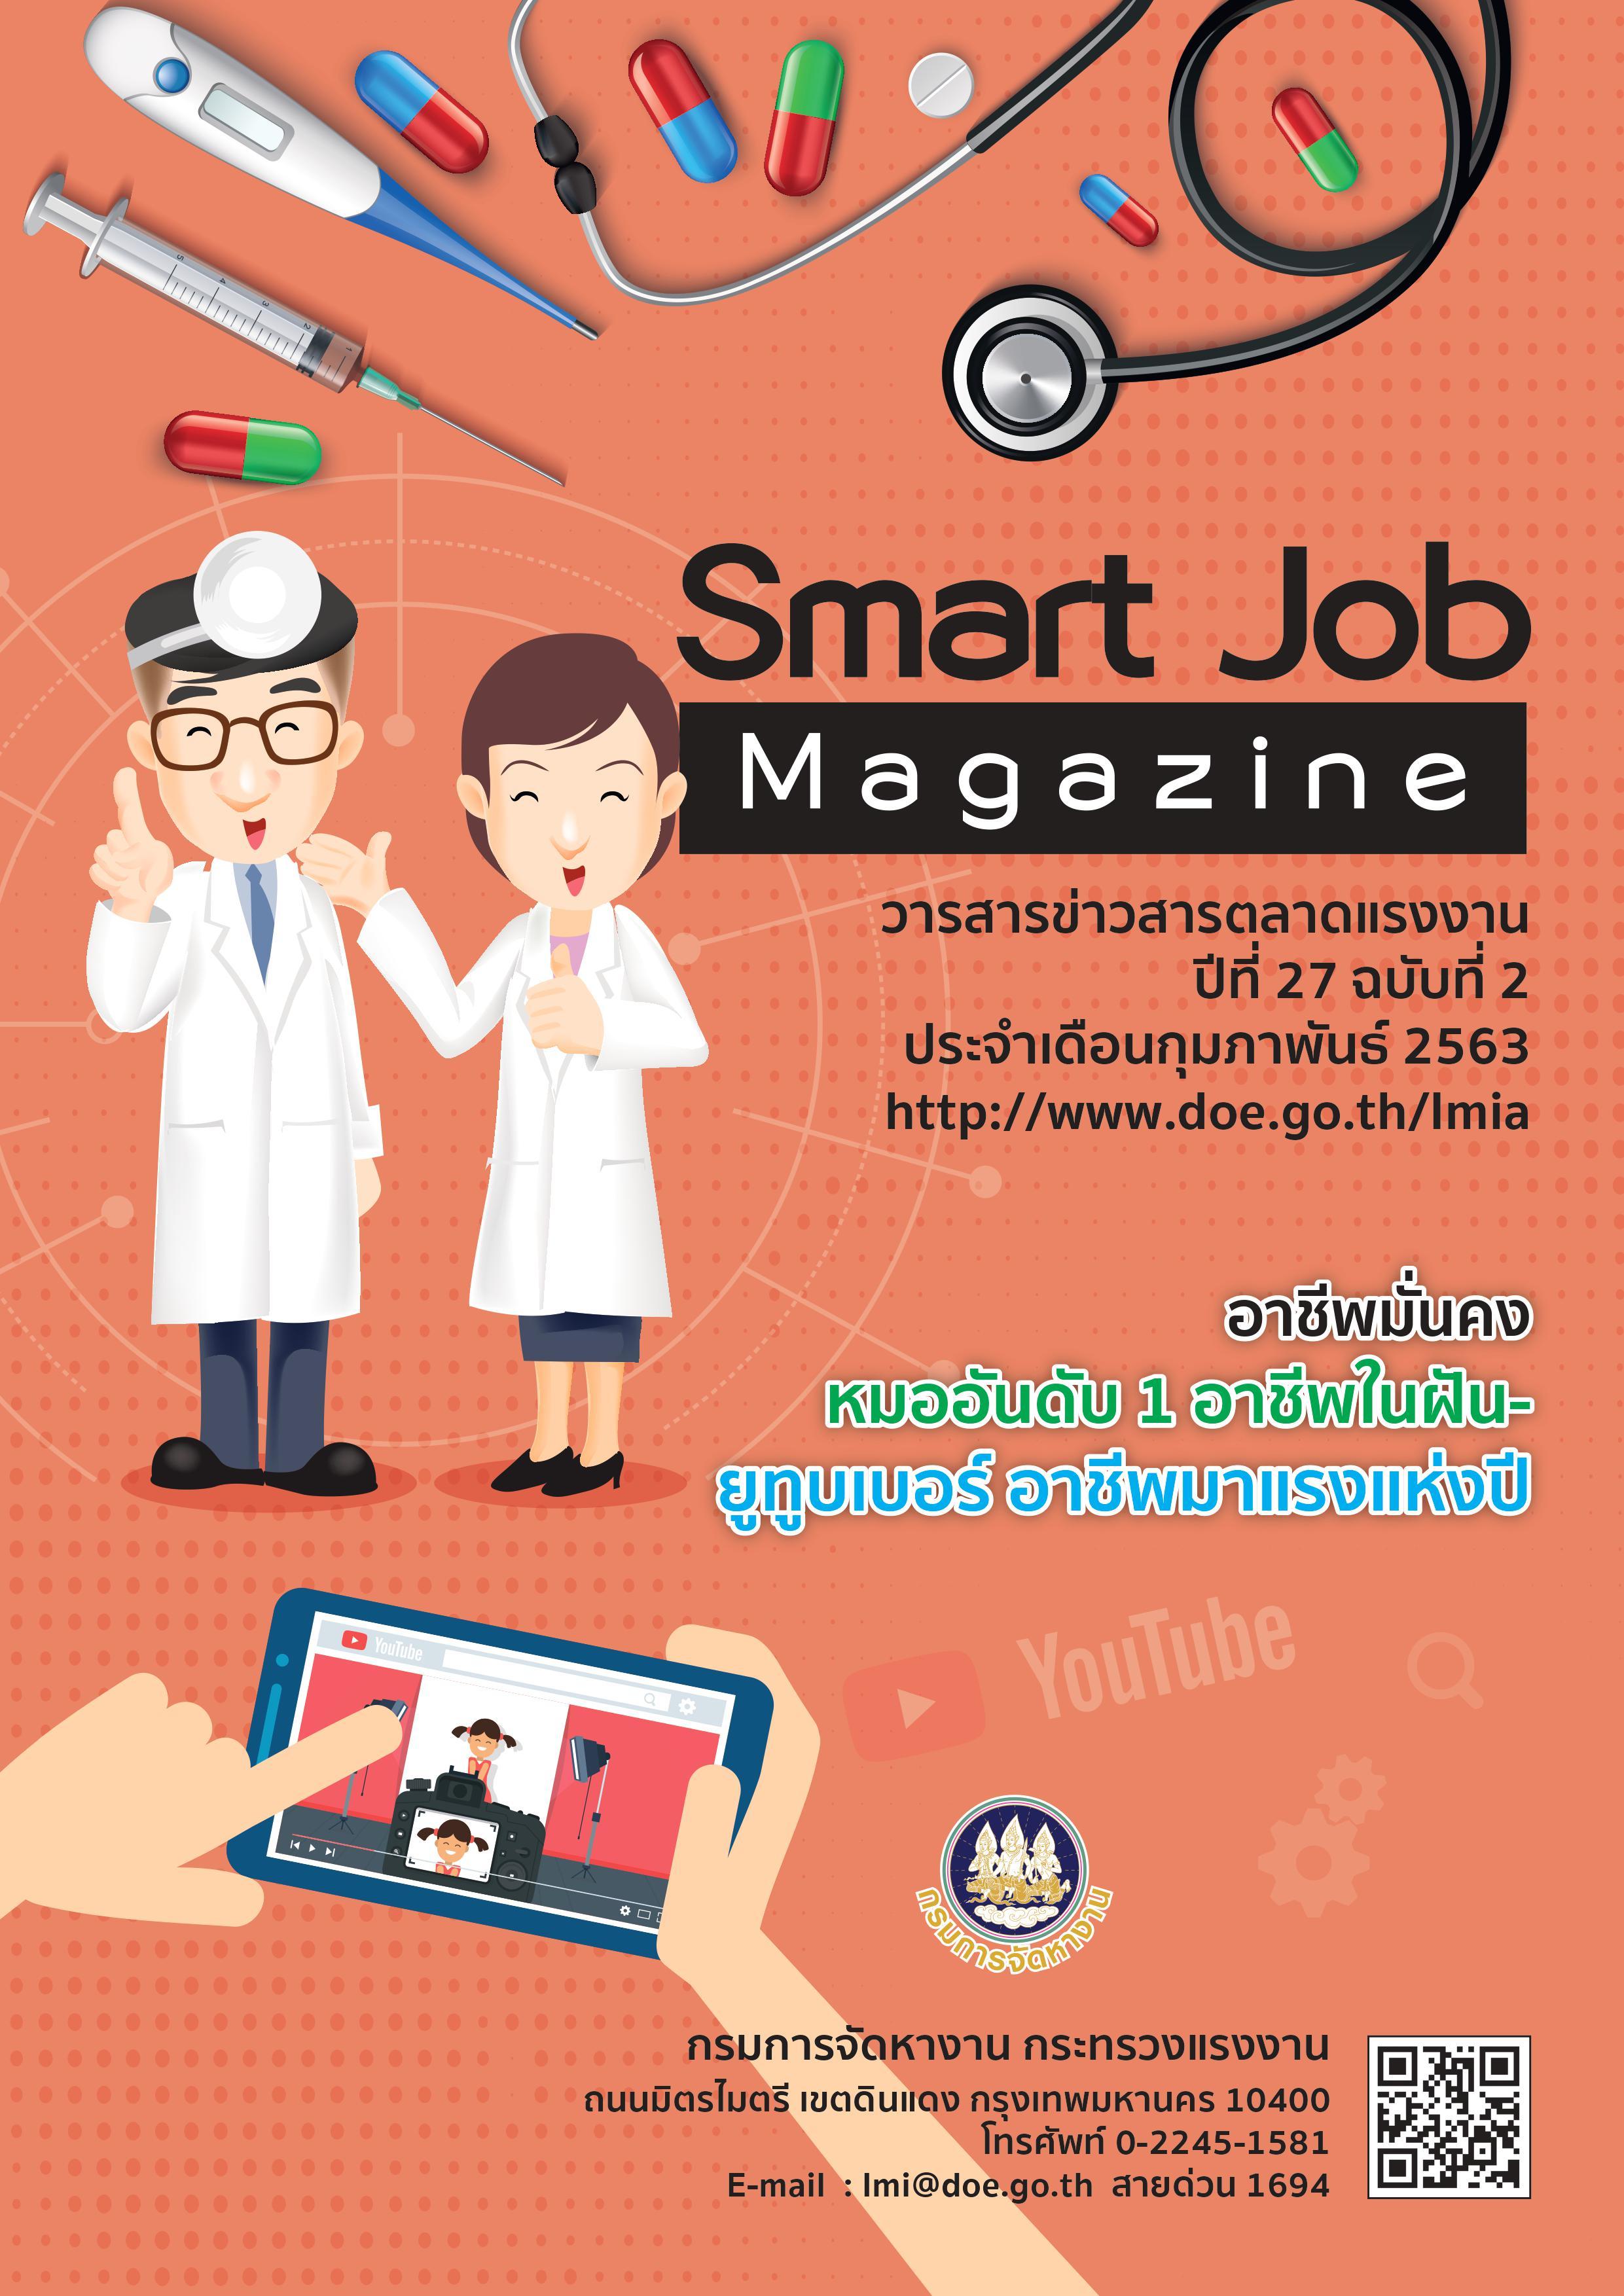 Smart Job Magazine วารสารสถานการณ์ตลาดแรงงาน ปีที่ 27 ฉบับที่ 2 ประจำเดือนกุมภาพันธ์ 2563